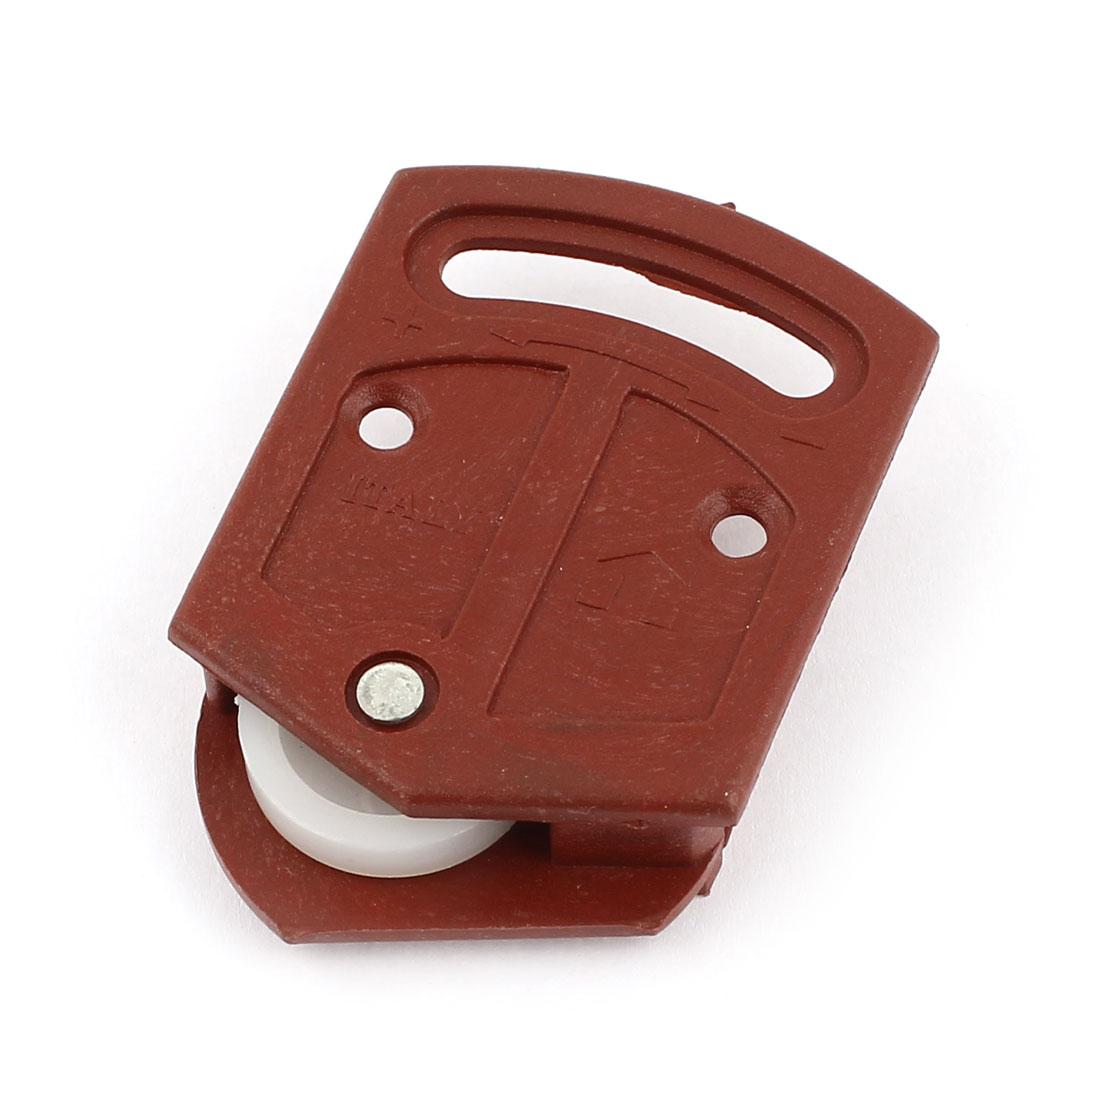 White Wheel Wardrobe Sliding Door Roller Parts 3.6mm Dia Bore Plate